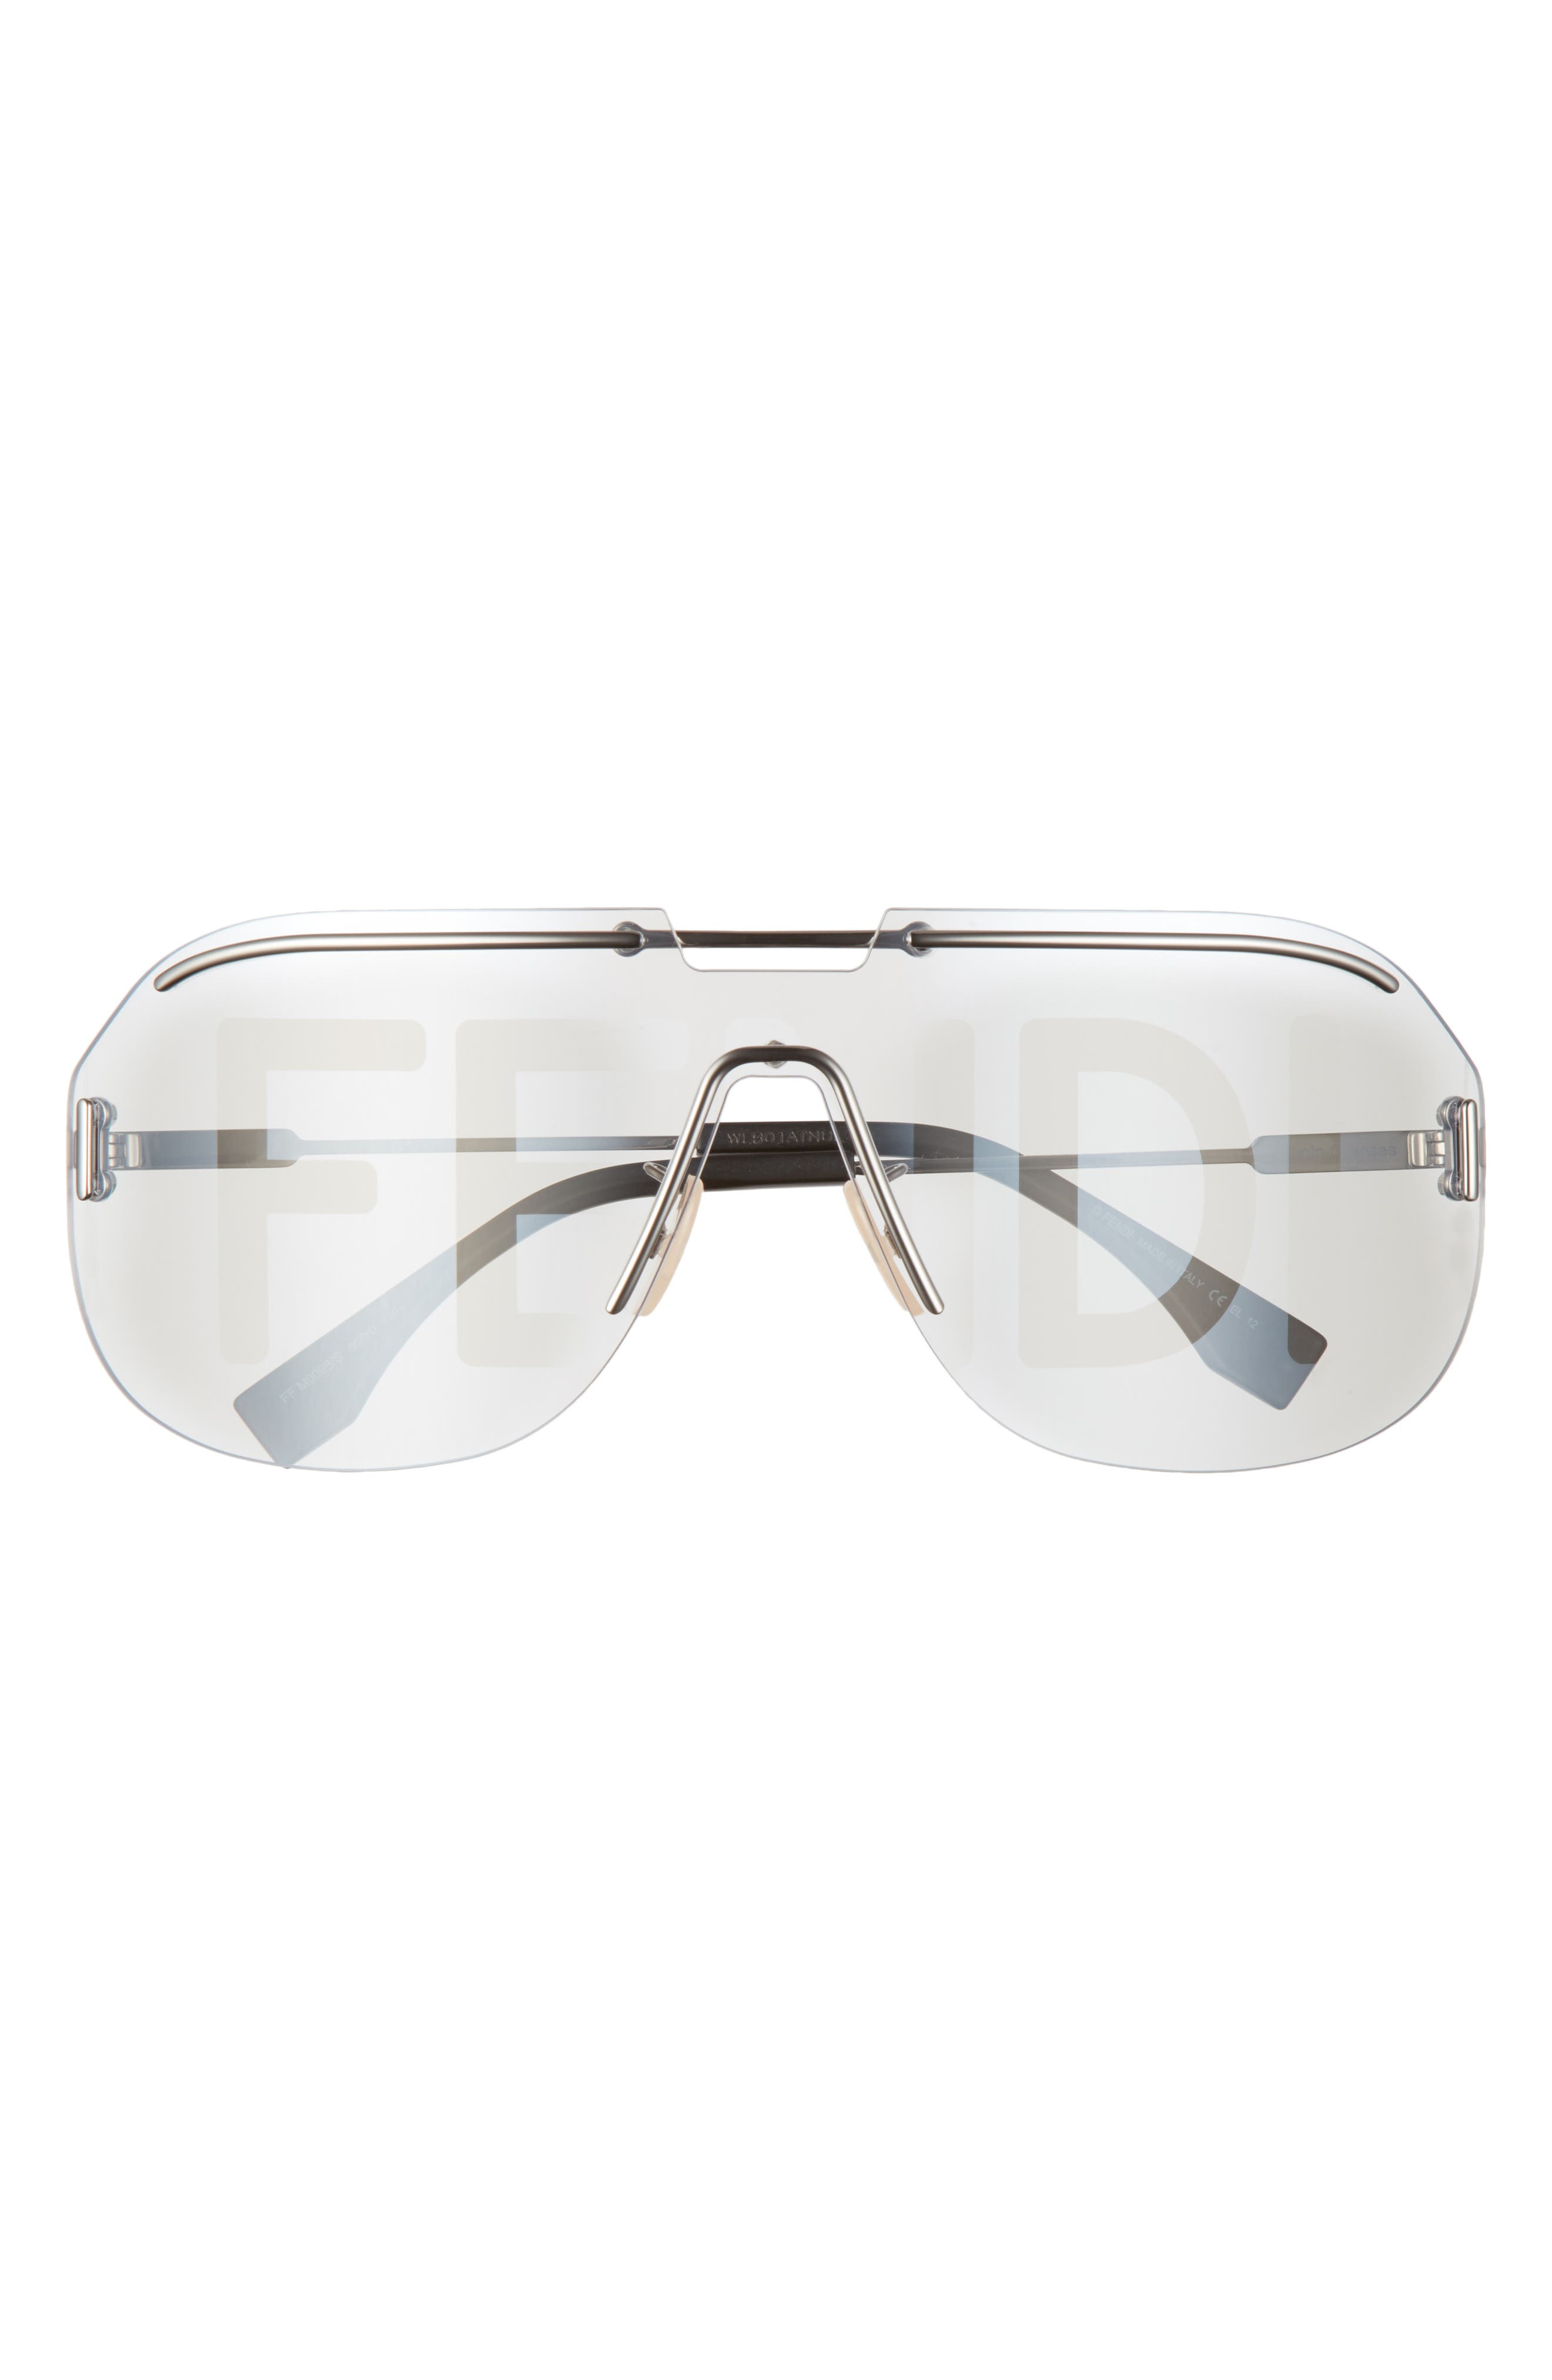 SDstore Unisex Classic Oversized Shield Frame Sunglasses Womens Polarized Sunglasses Holiday Sunglasses for Women